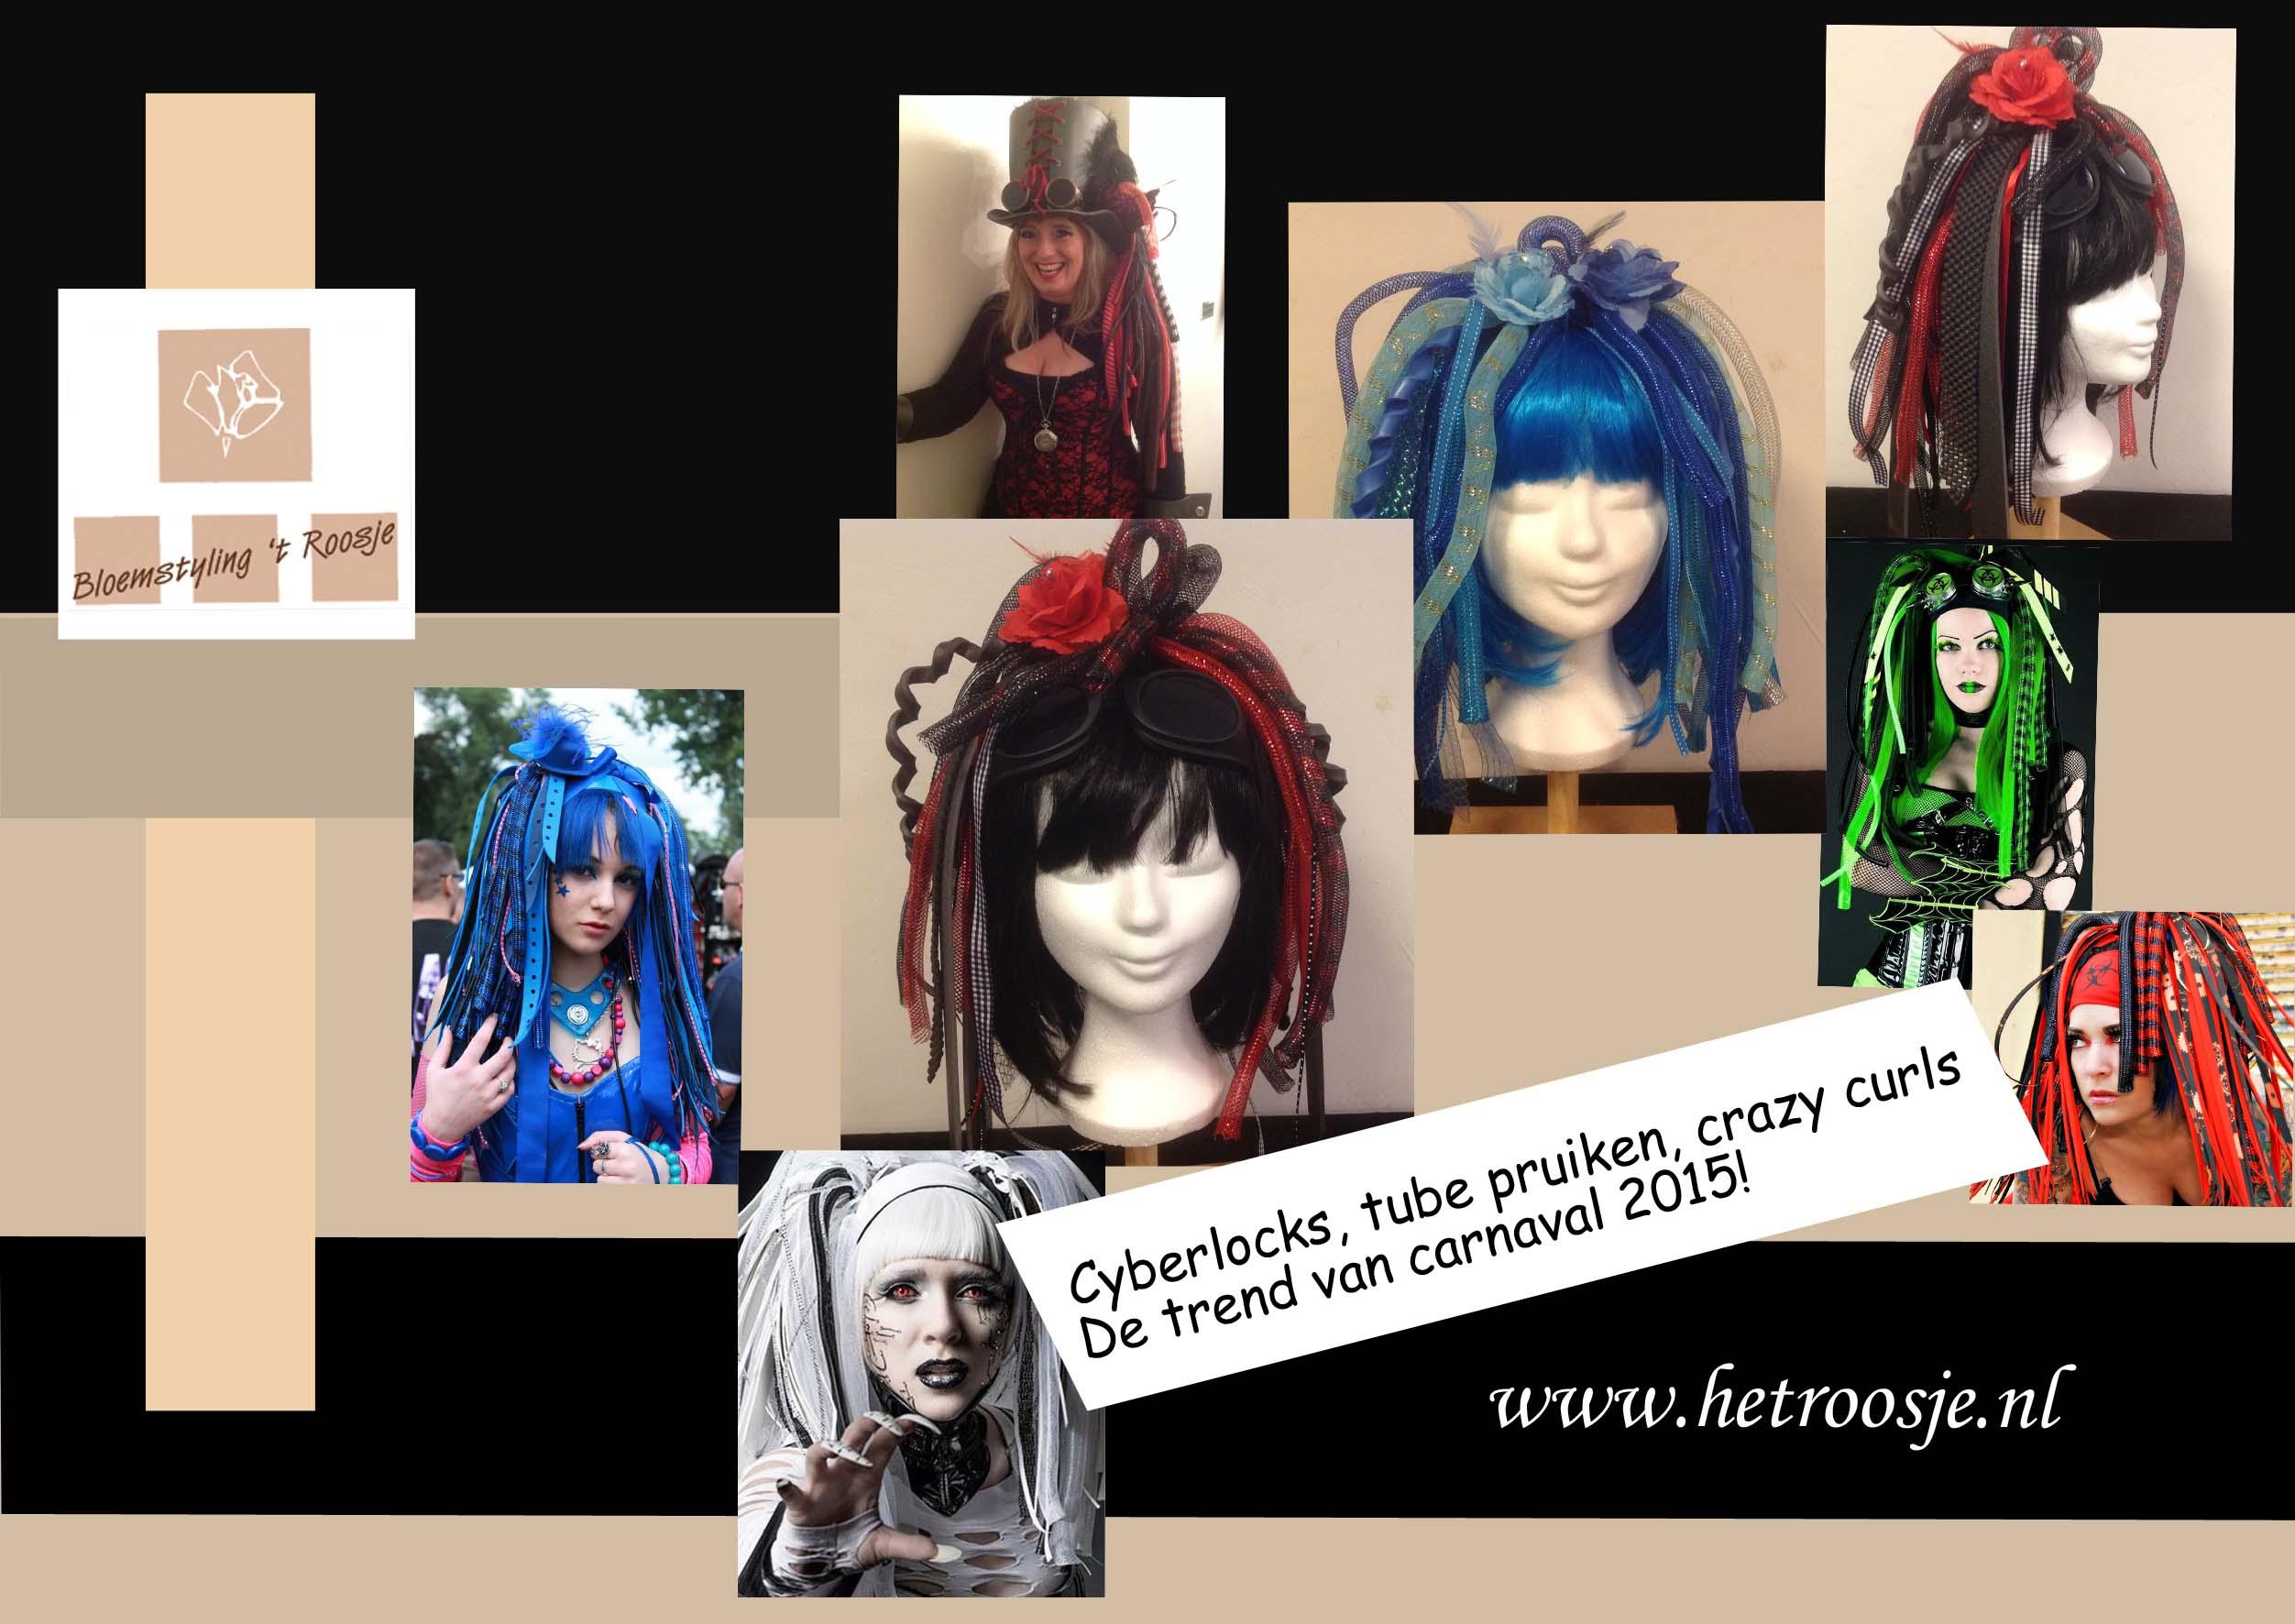 tubepruik/cyberlocks/crazy curls